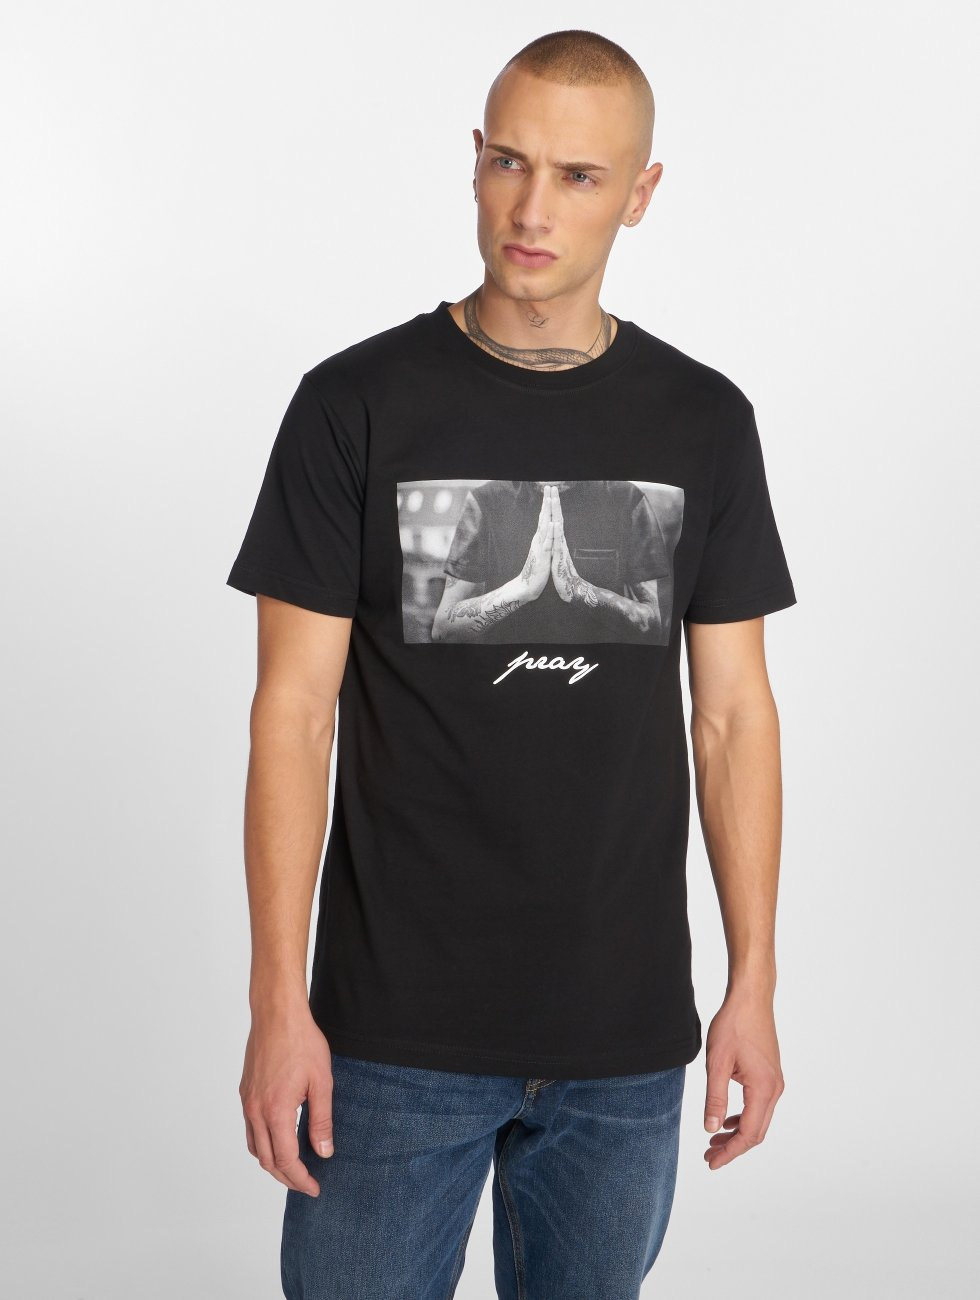 Mister Tee T-Shirt Pray schwarz